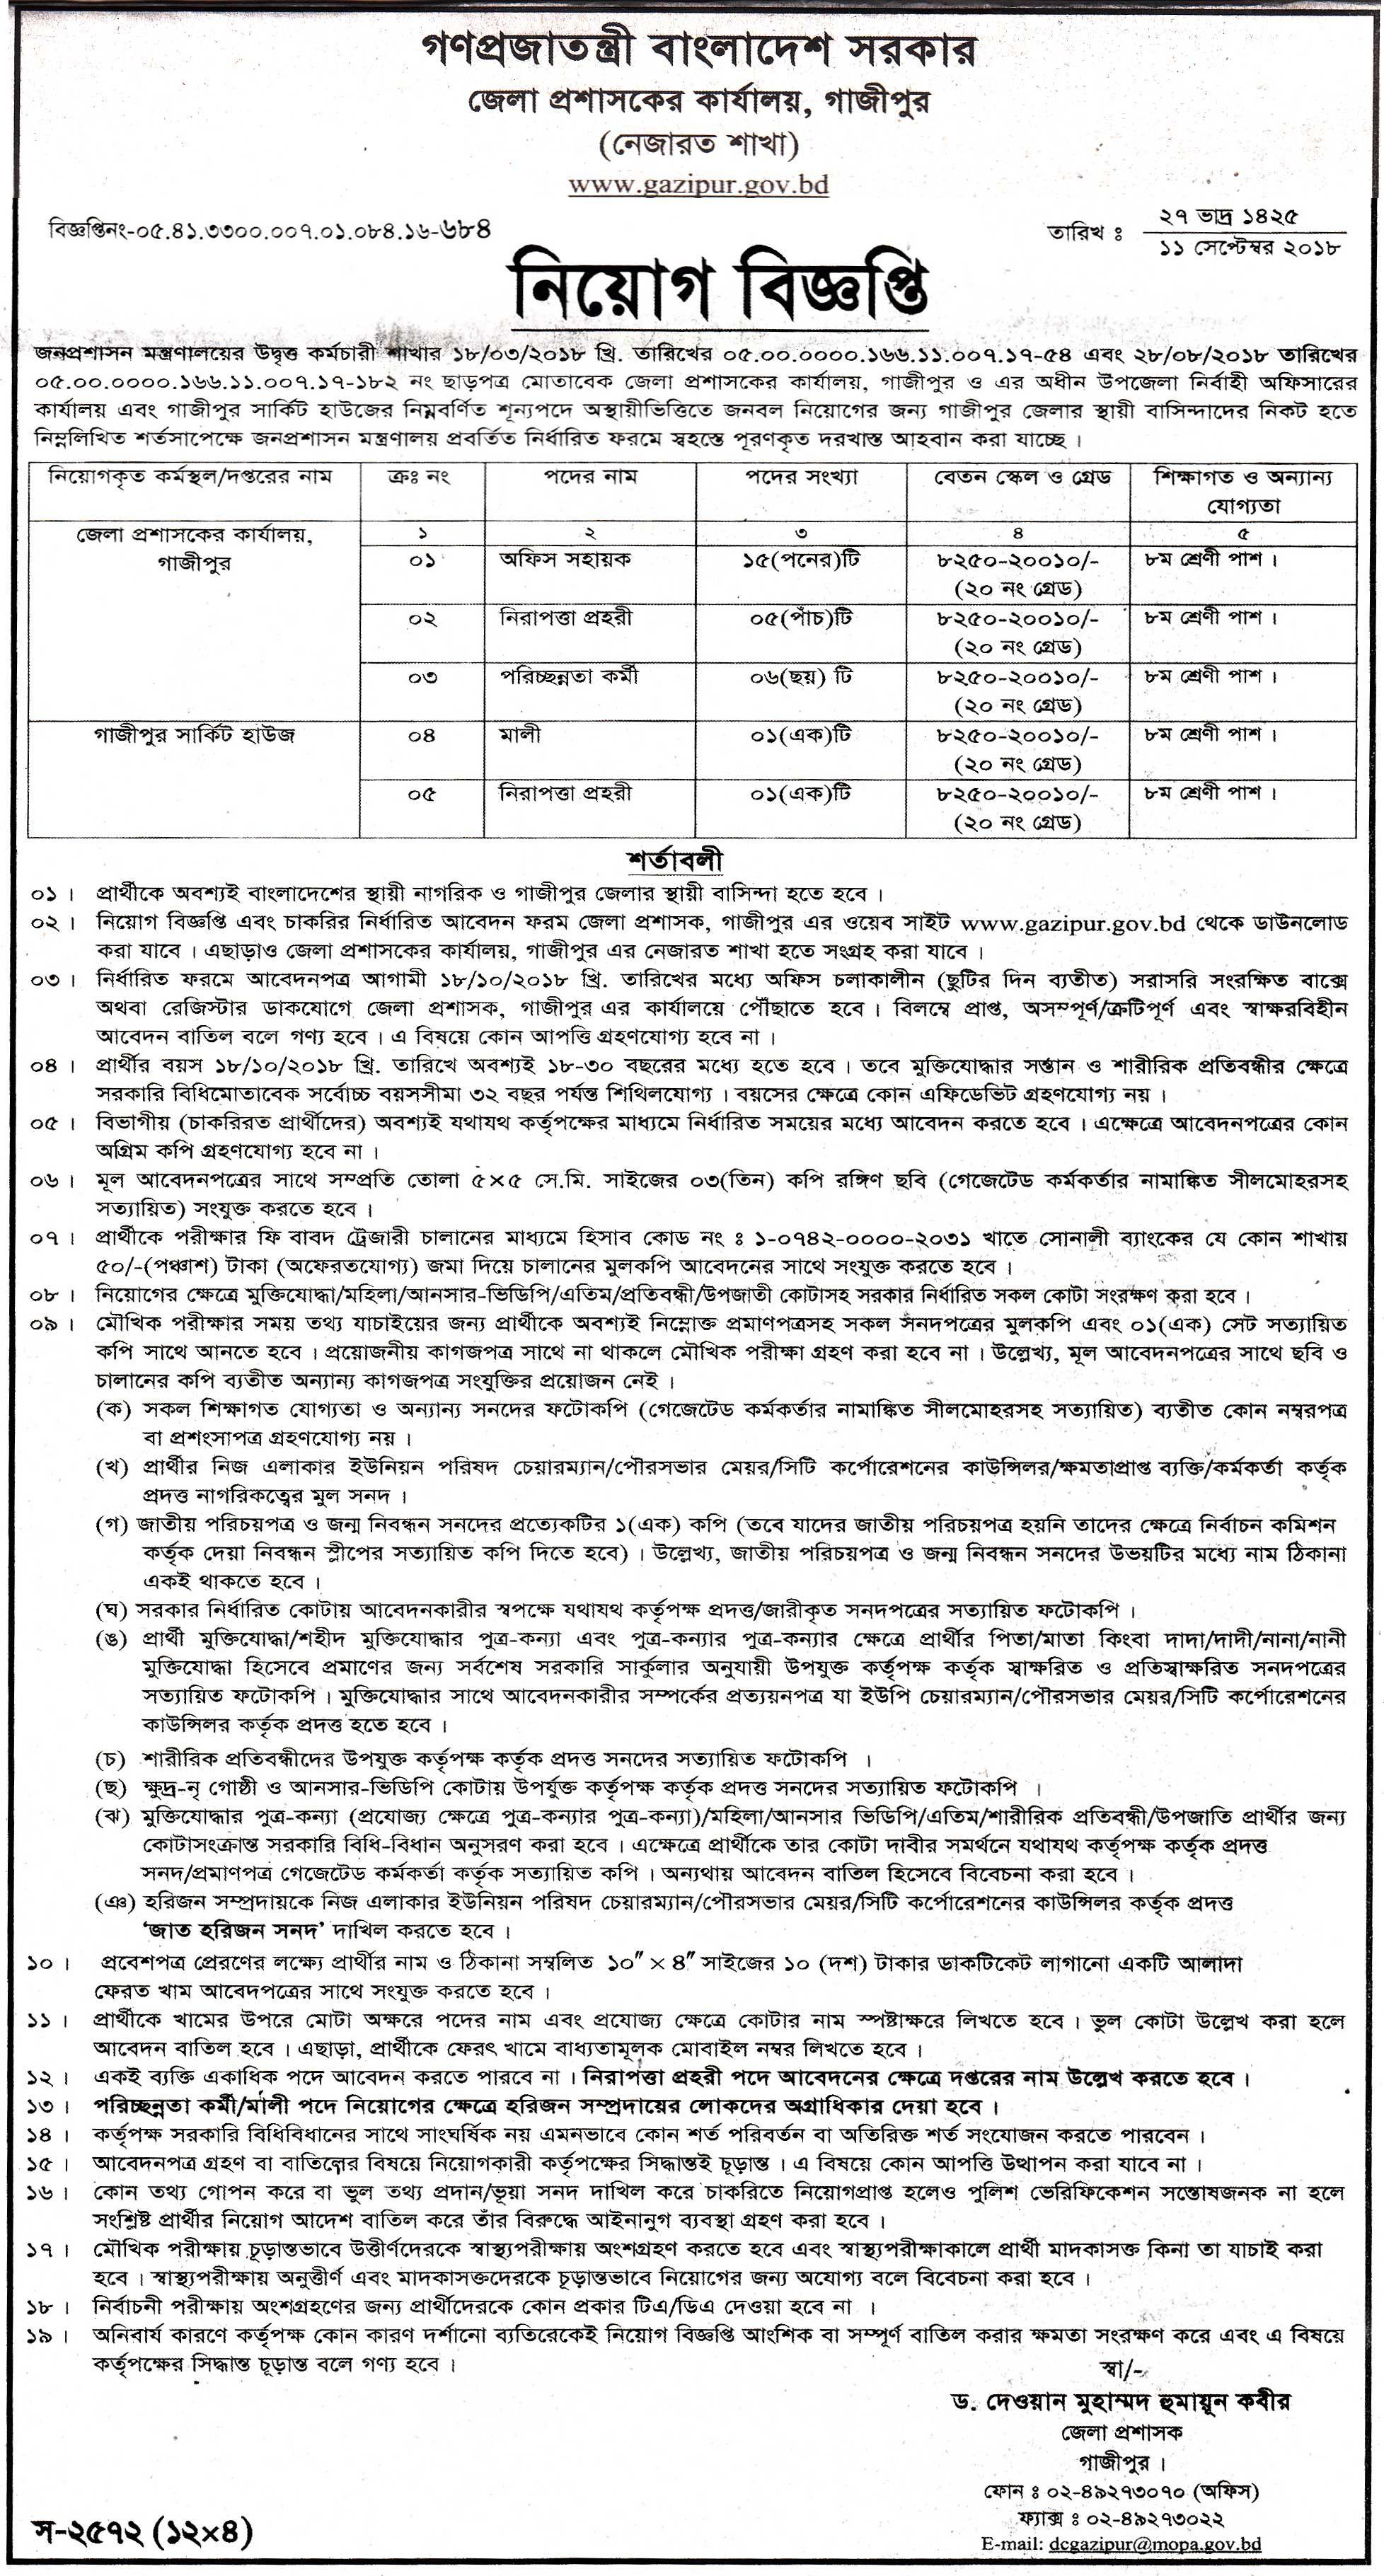 DC Officer, Gazipur Jobs Circular 11.09.2018 Job